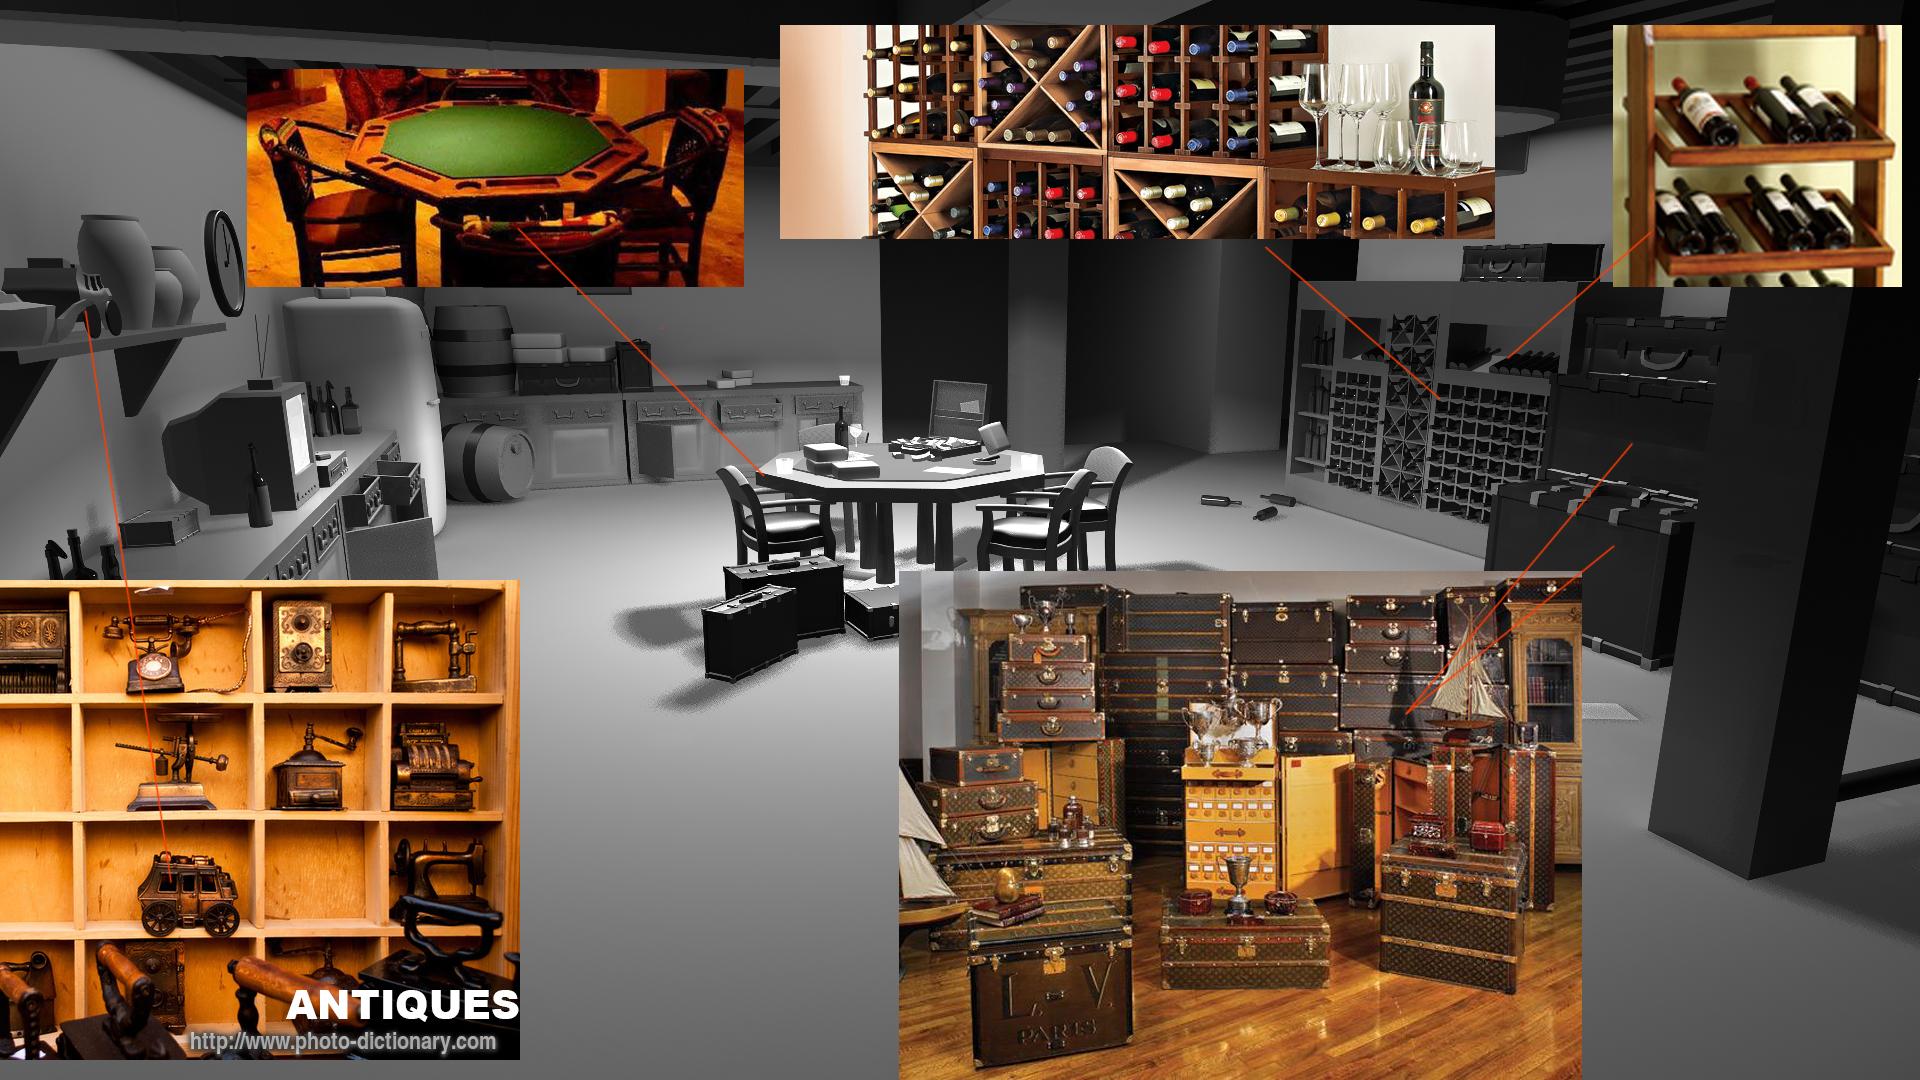 basement_negotiation_room_concept_photorefs.jpg